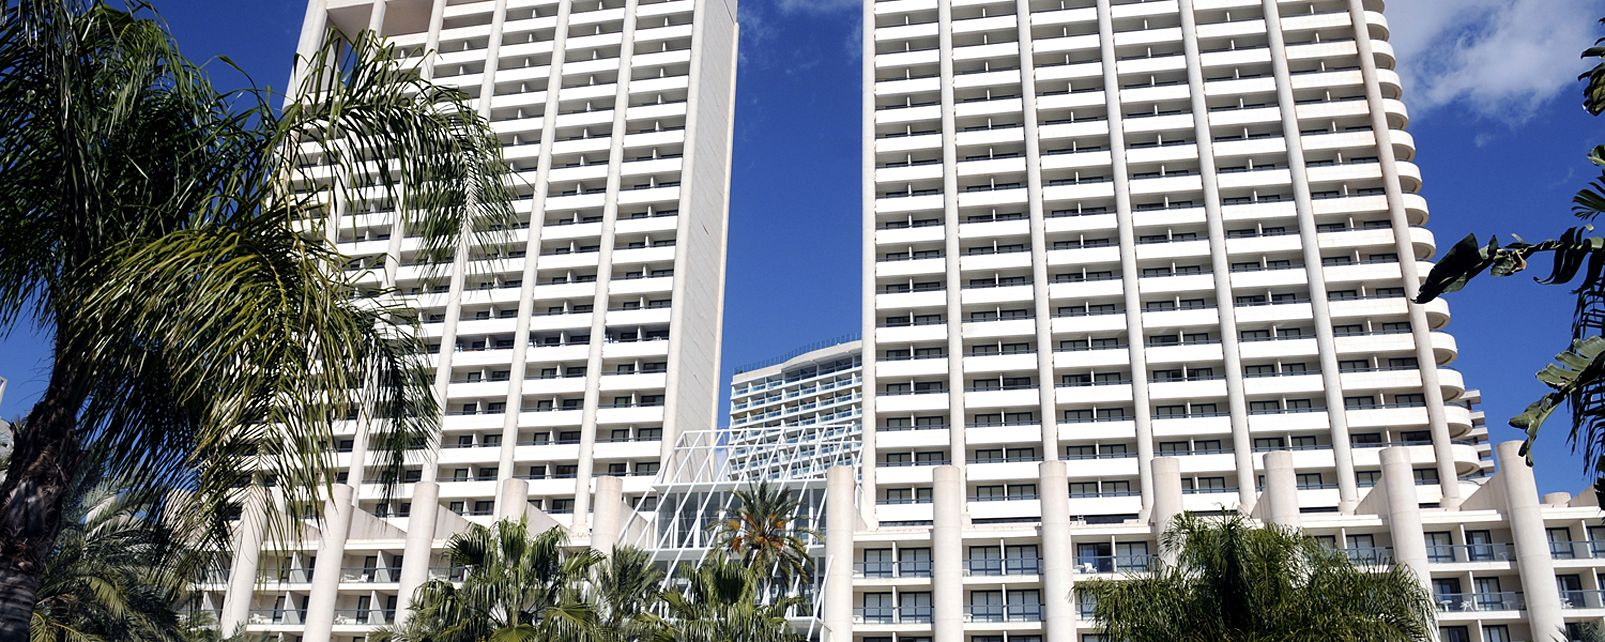 Hôtel Meliá Benidorm